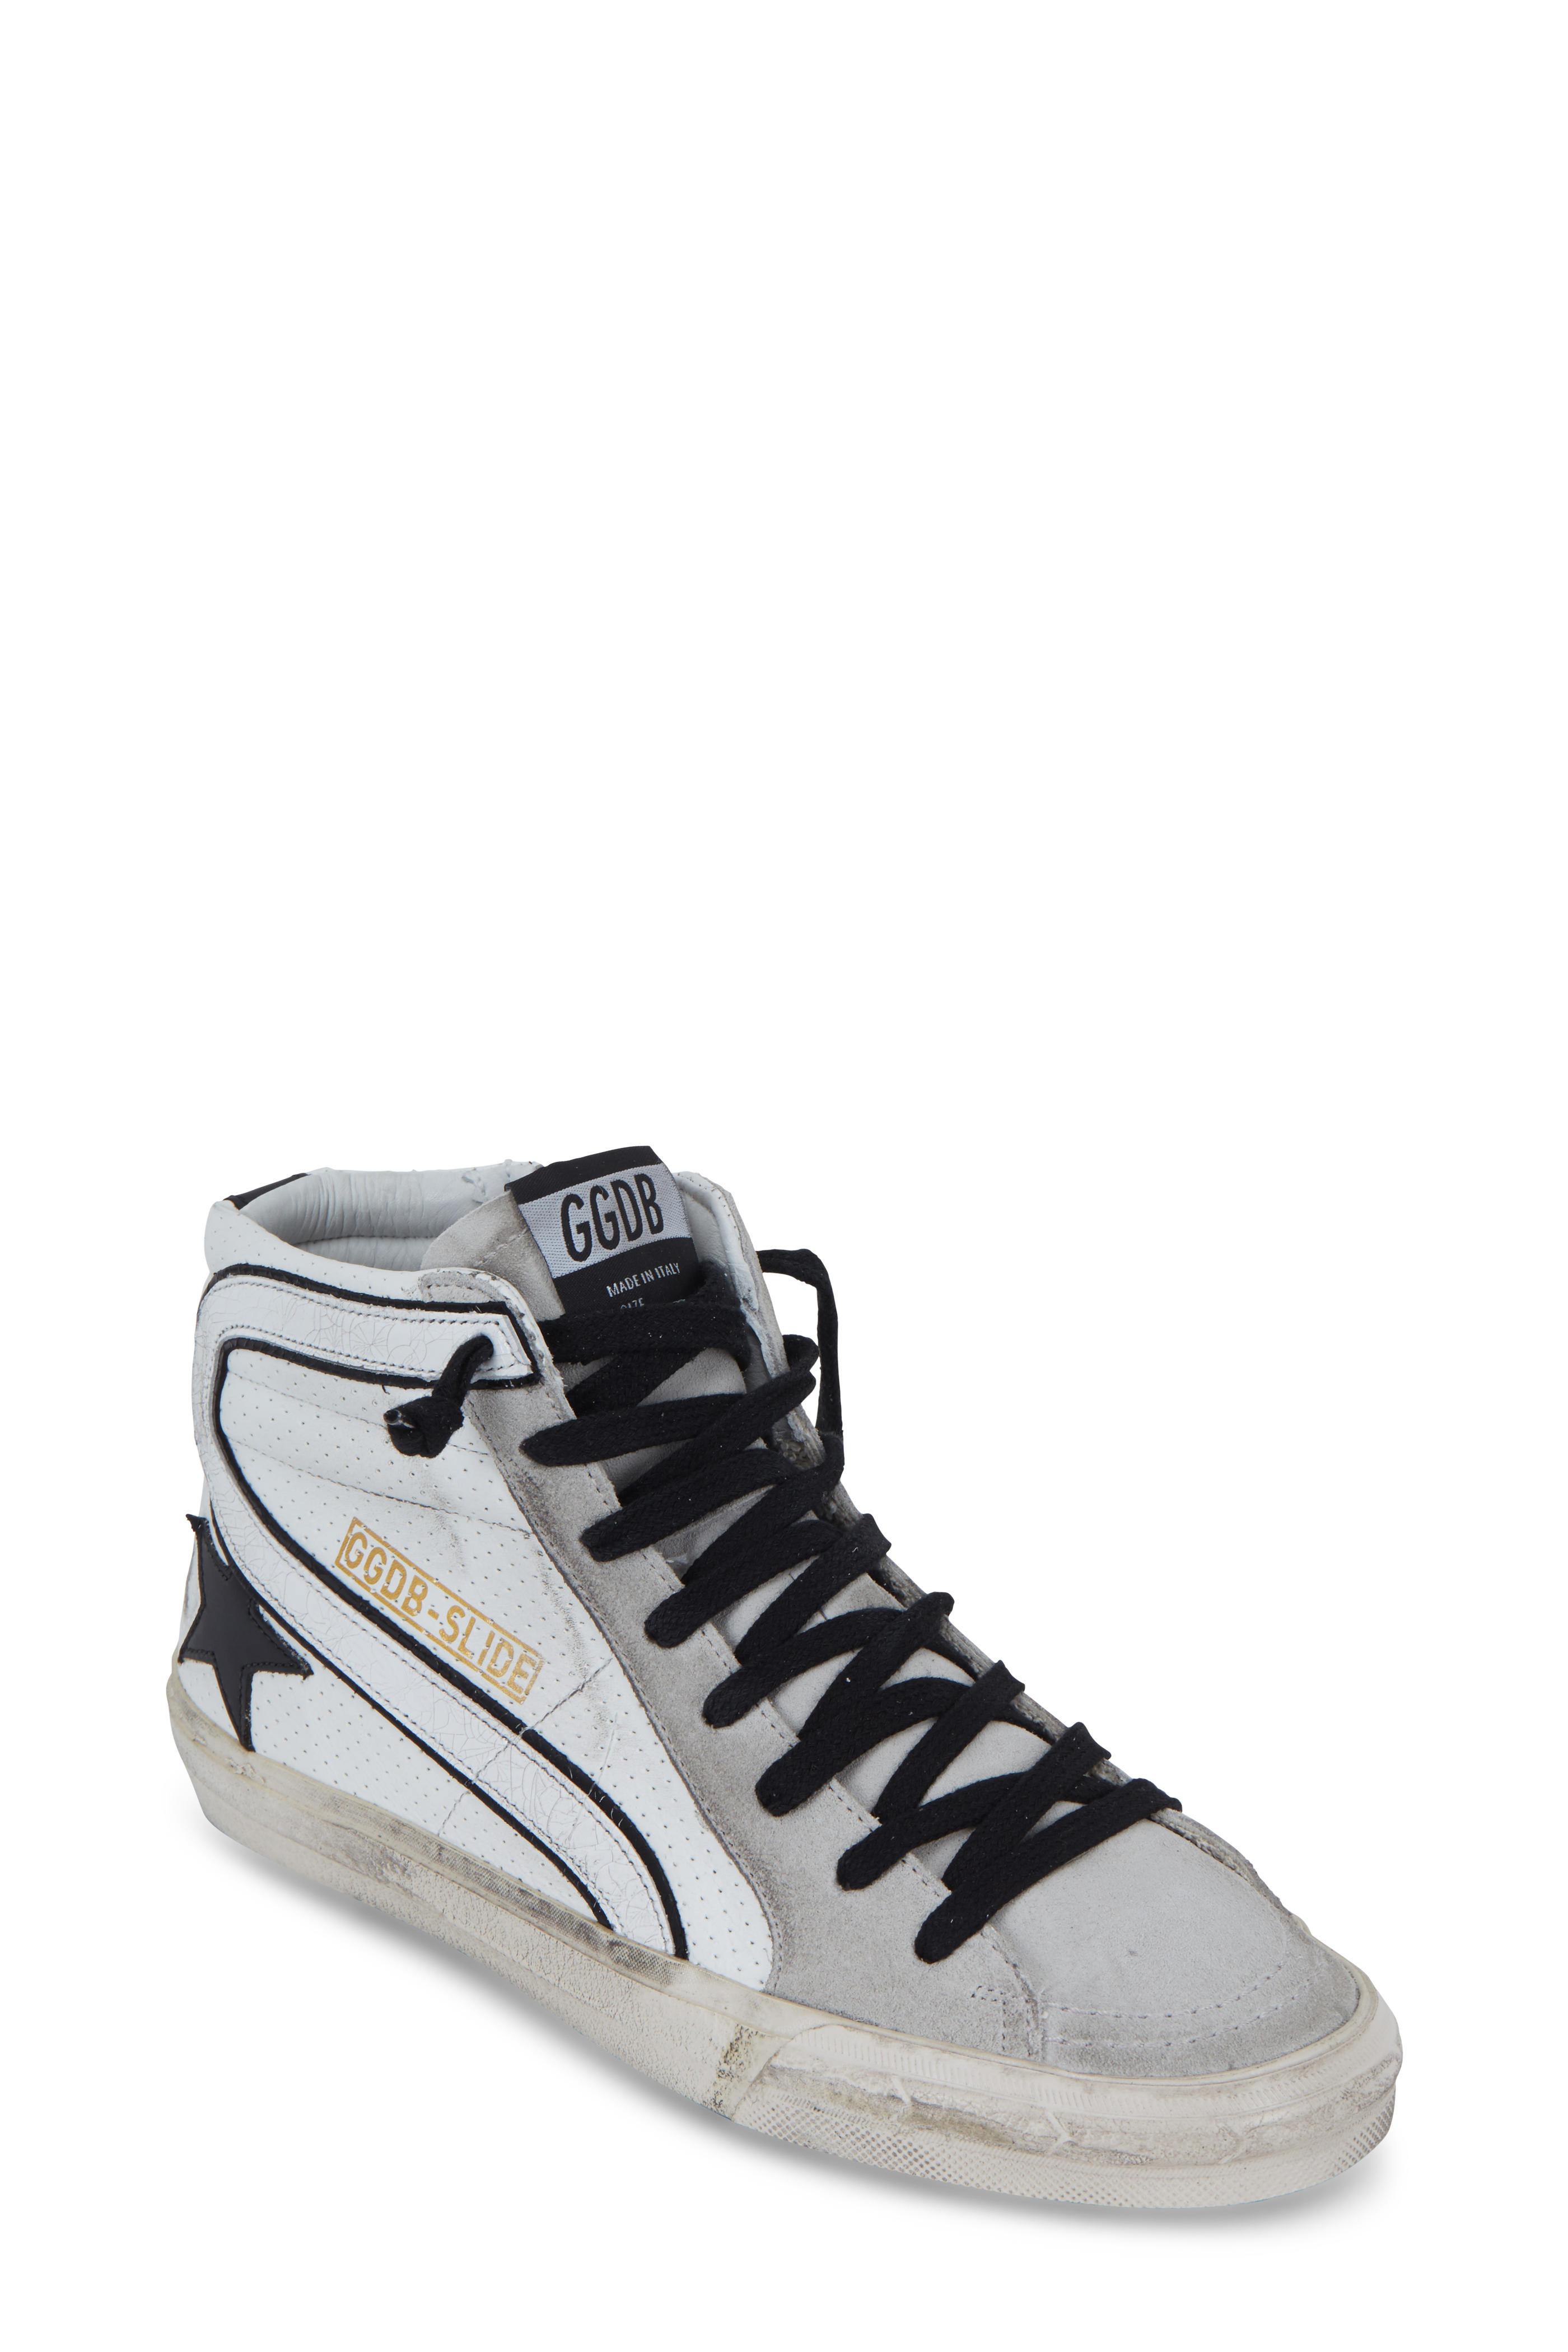 391a4a4193853 Golden Goose - Slide White Leather   Black Slide High Top Sneaker ...